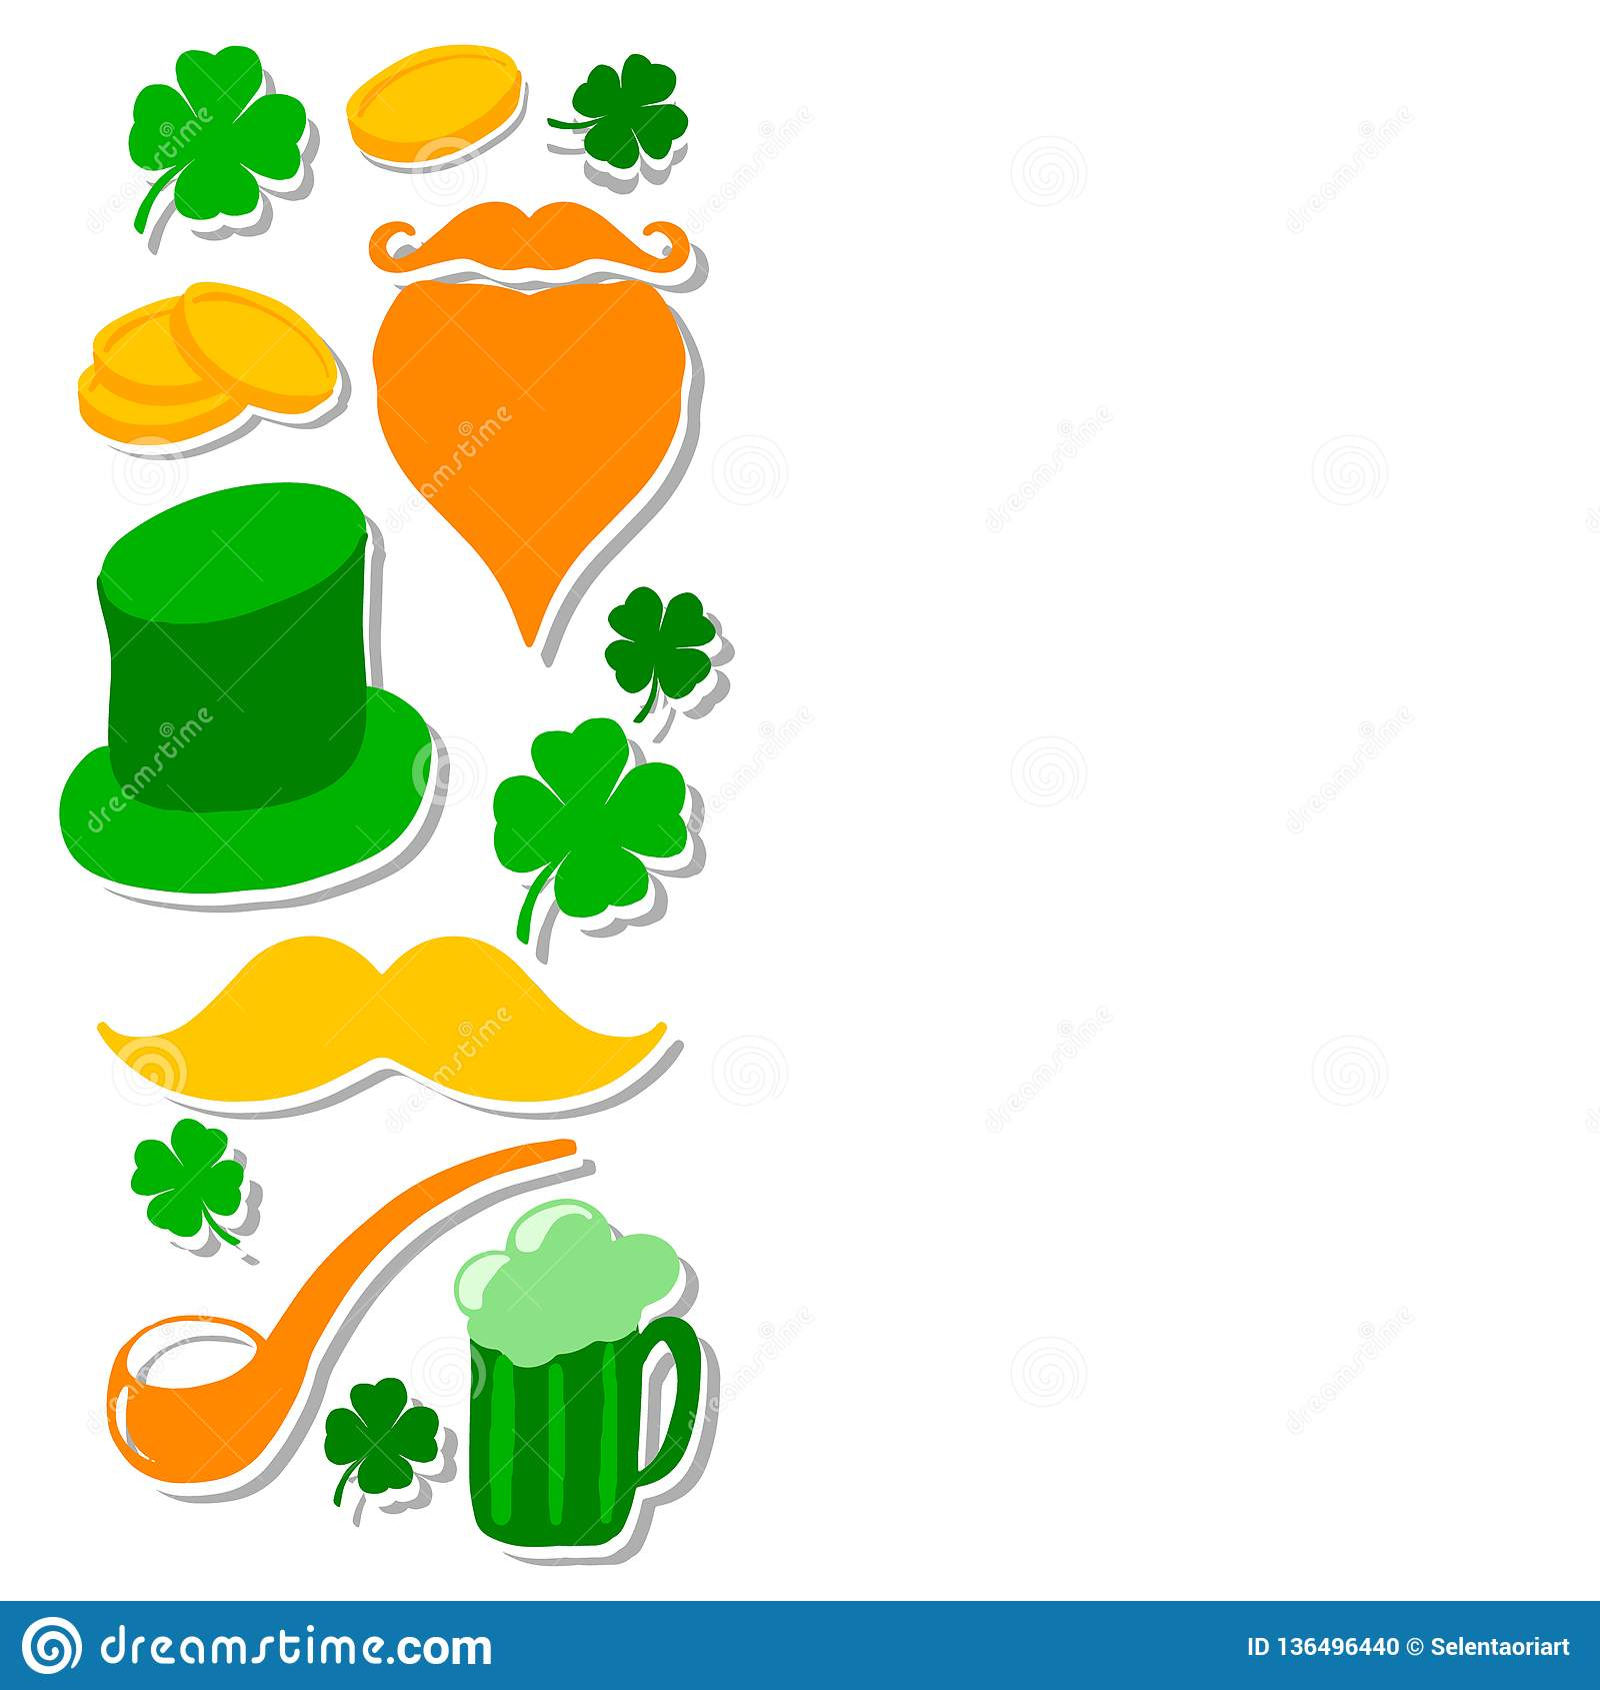 St. Patricks Day set with